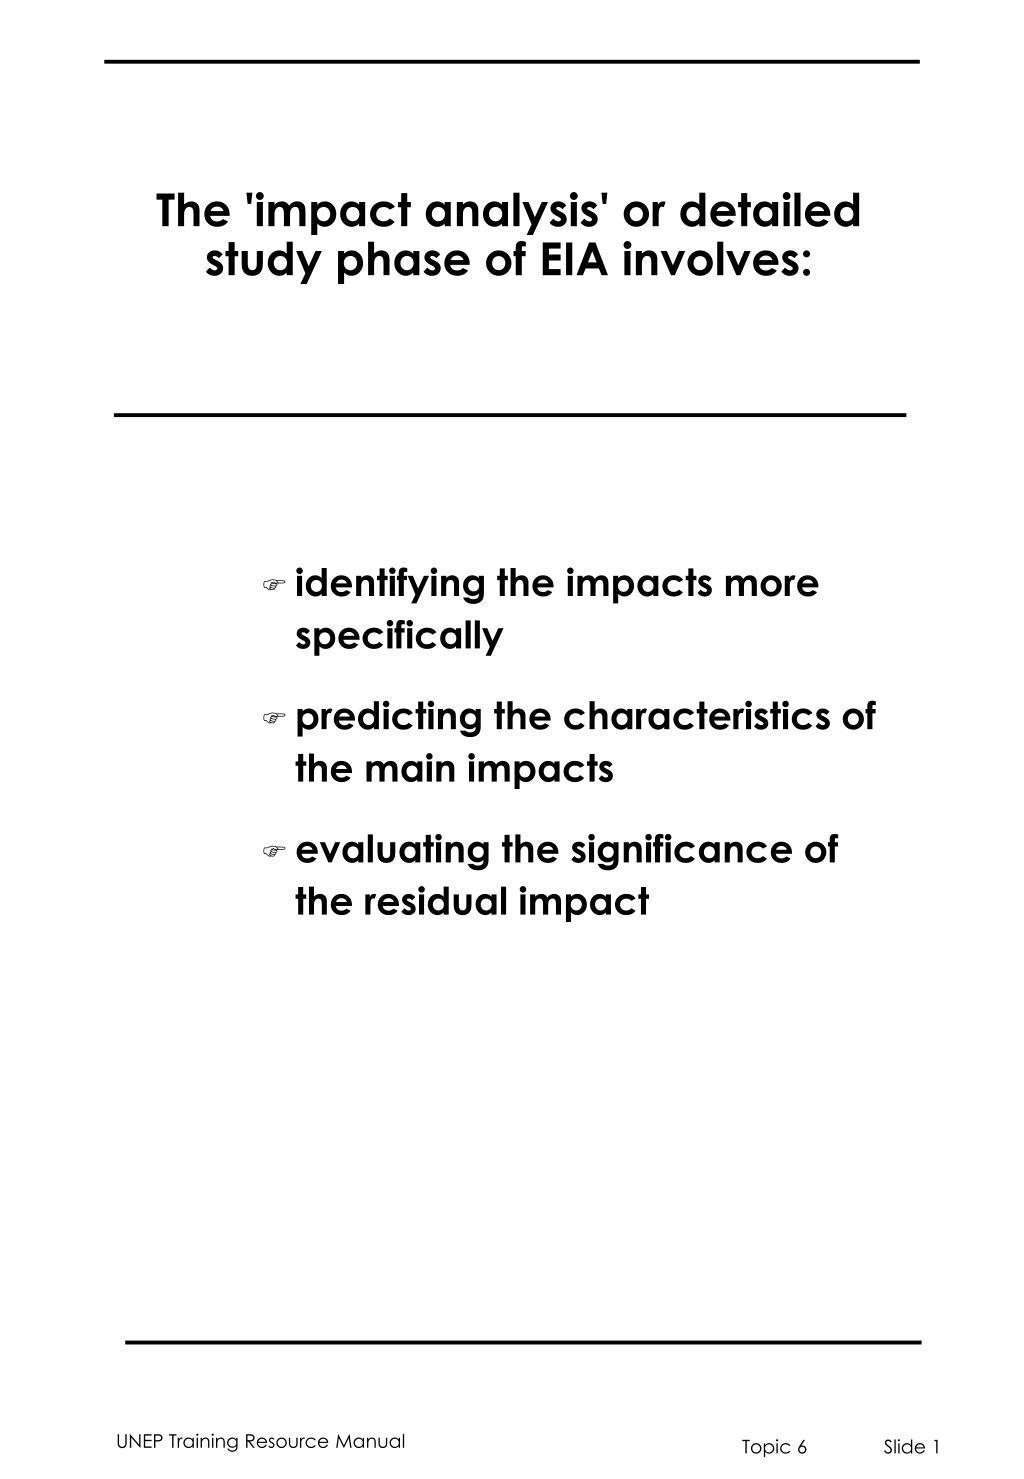 The 'impact analysis' or detailed study phase of EIA involves: